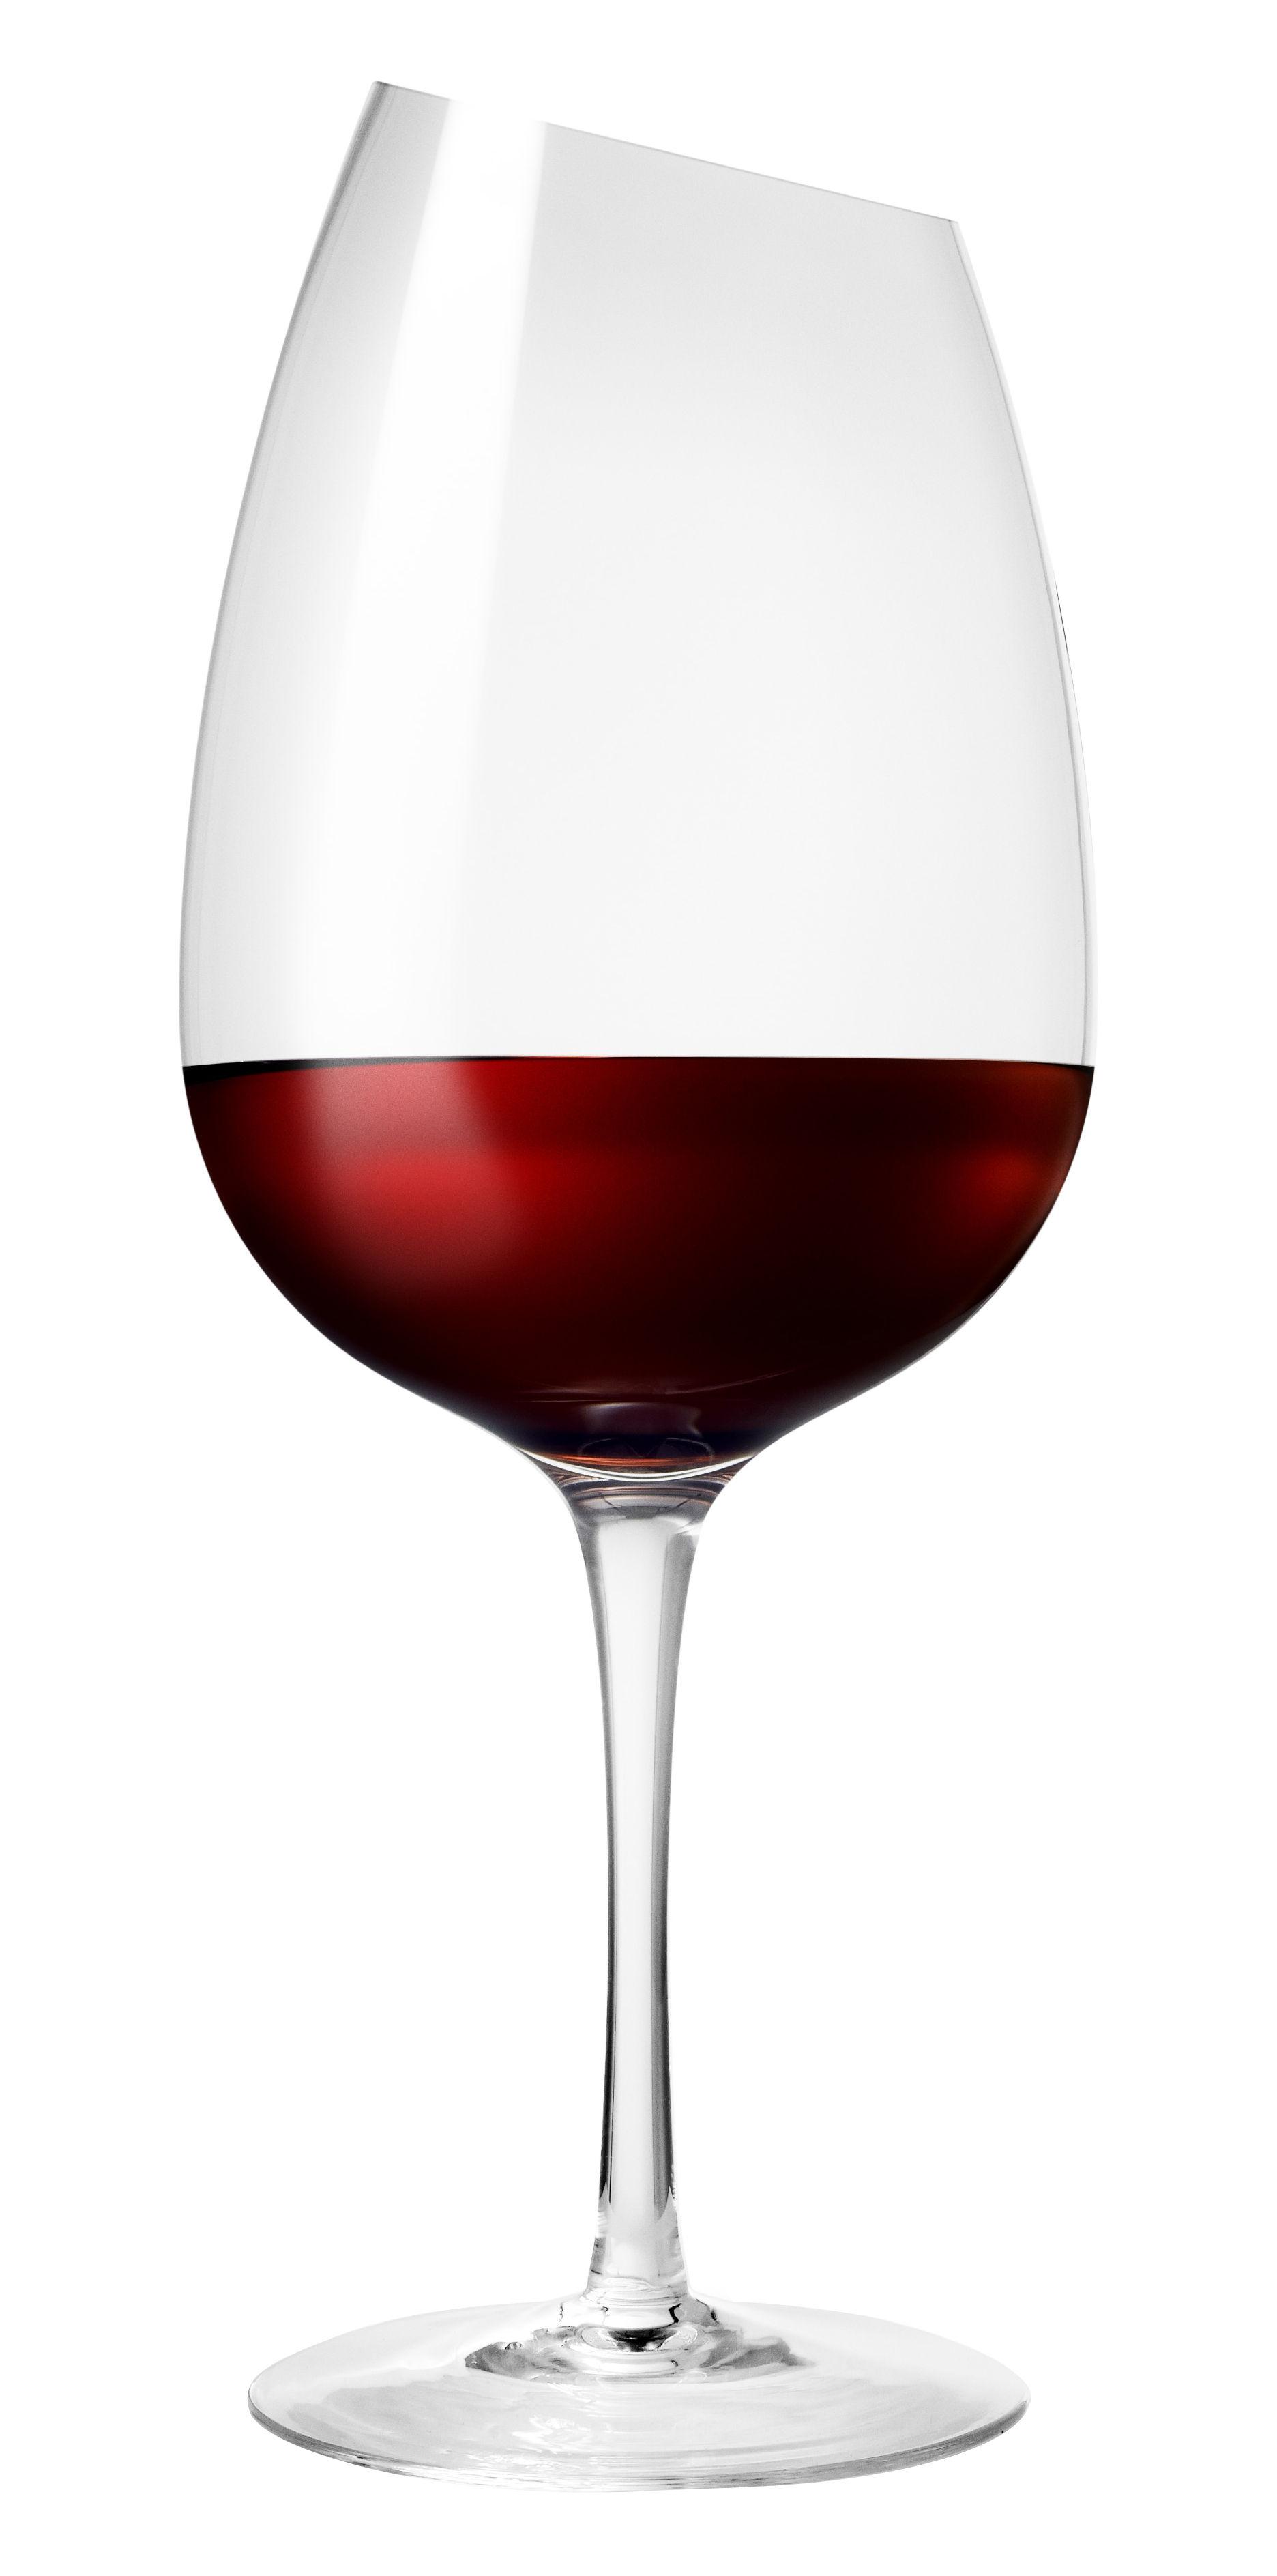 verre a vin rouge